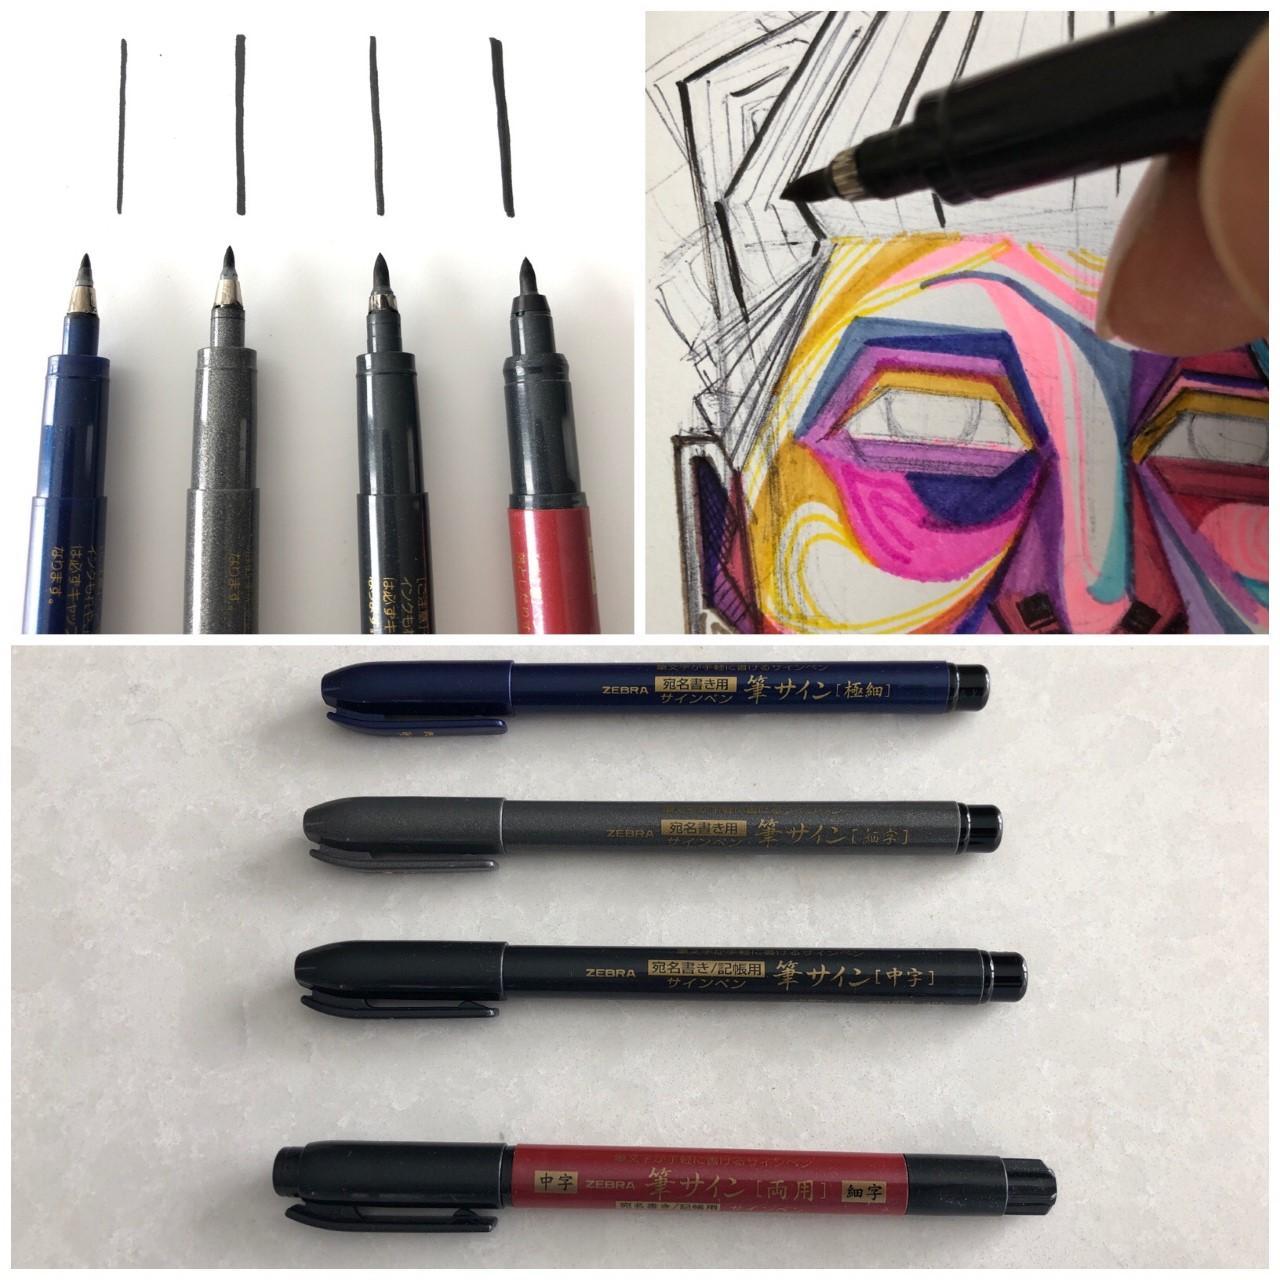 Zensations Brush Pens